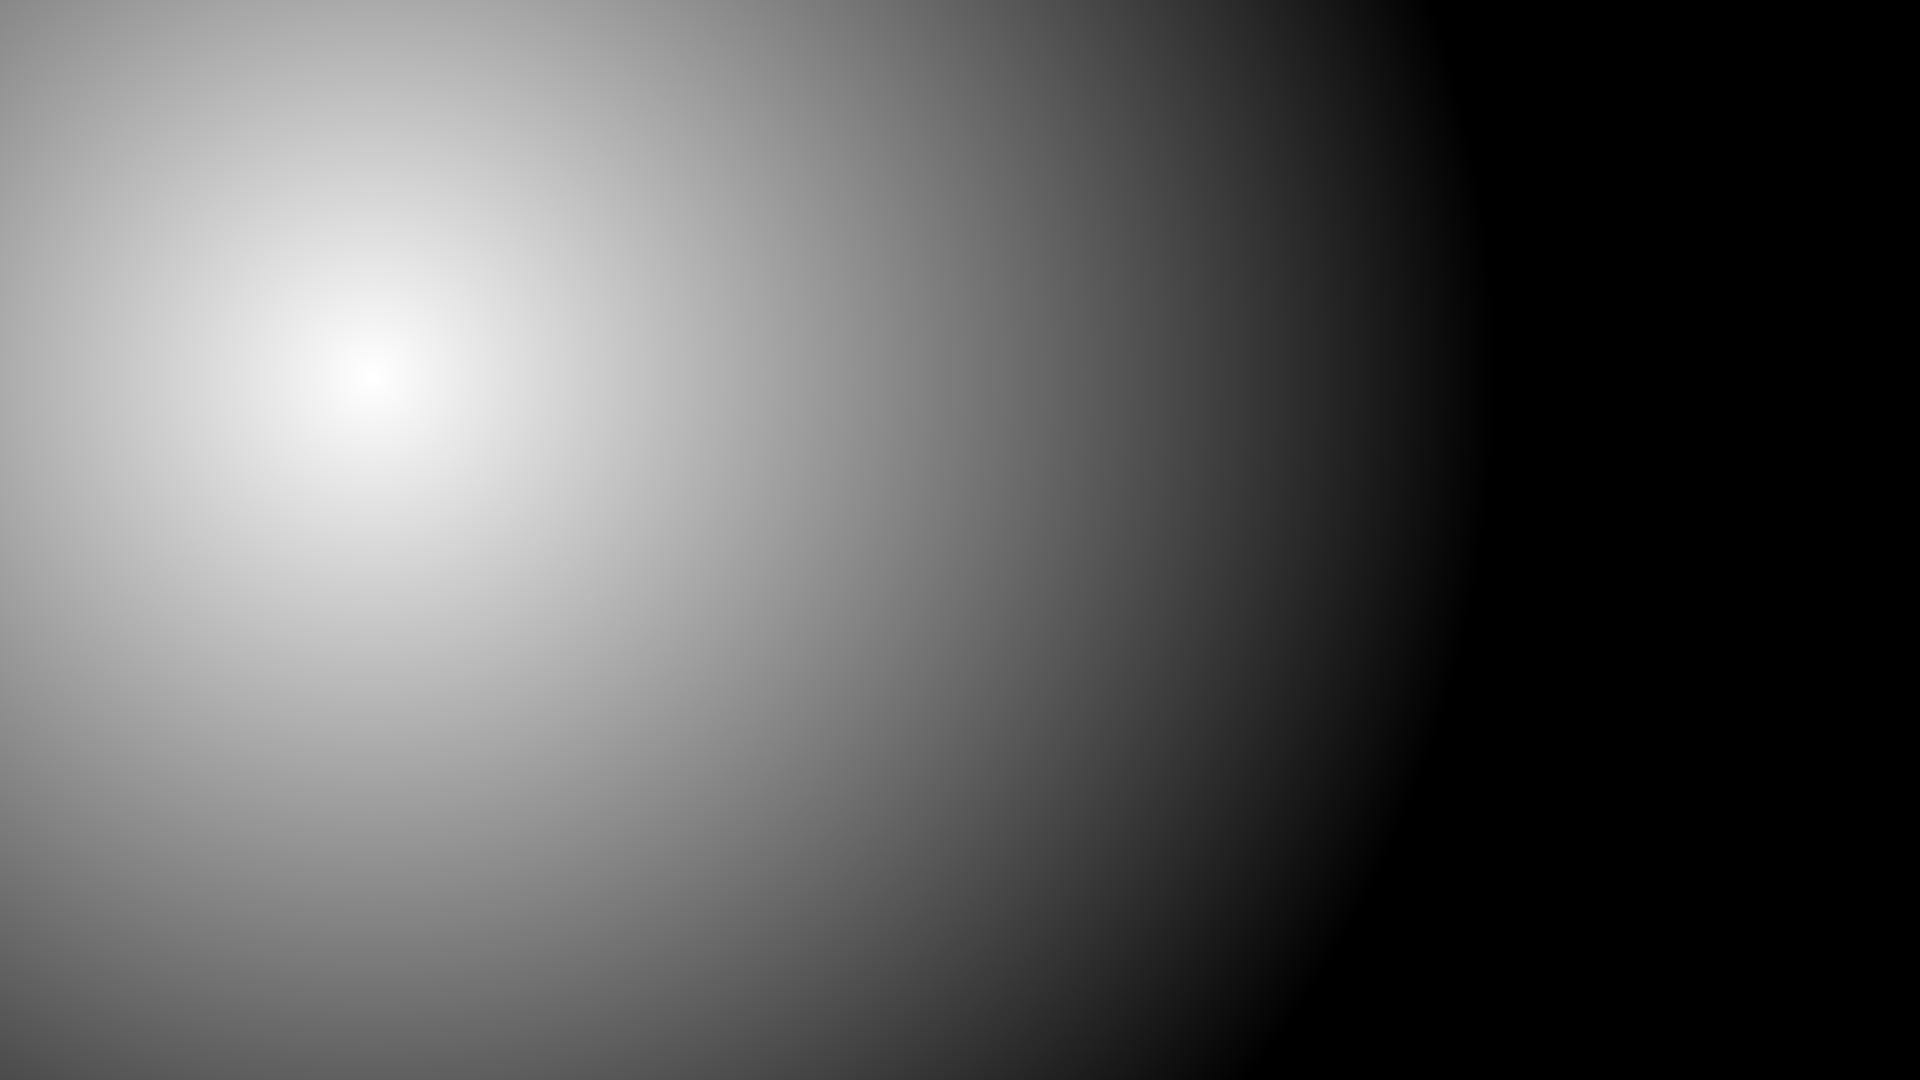 wallpaper desktop white black gradient circular 1920x1080